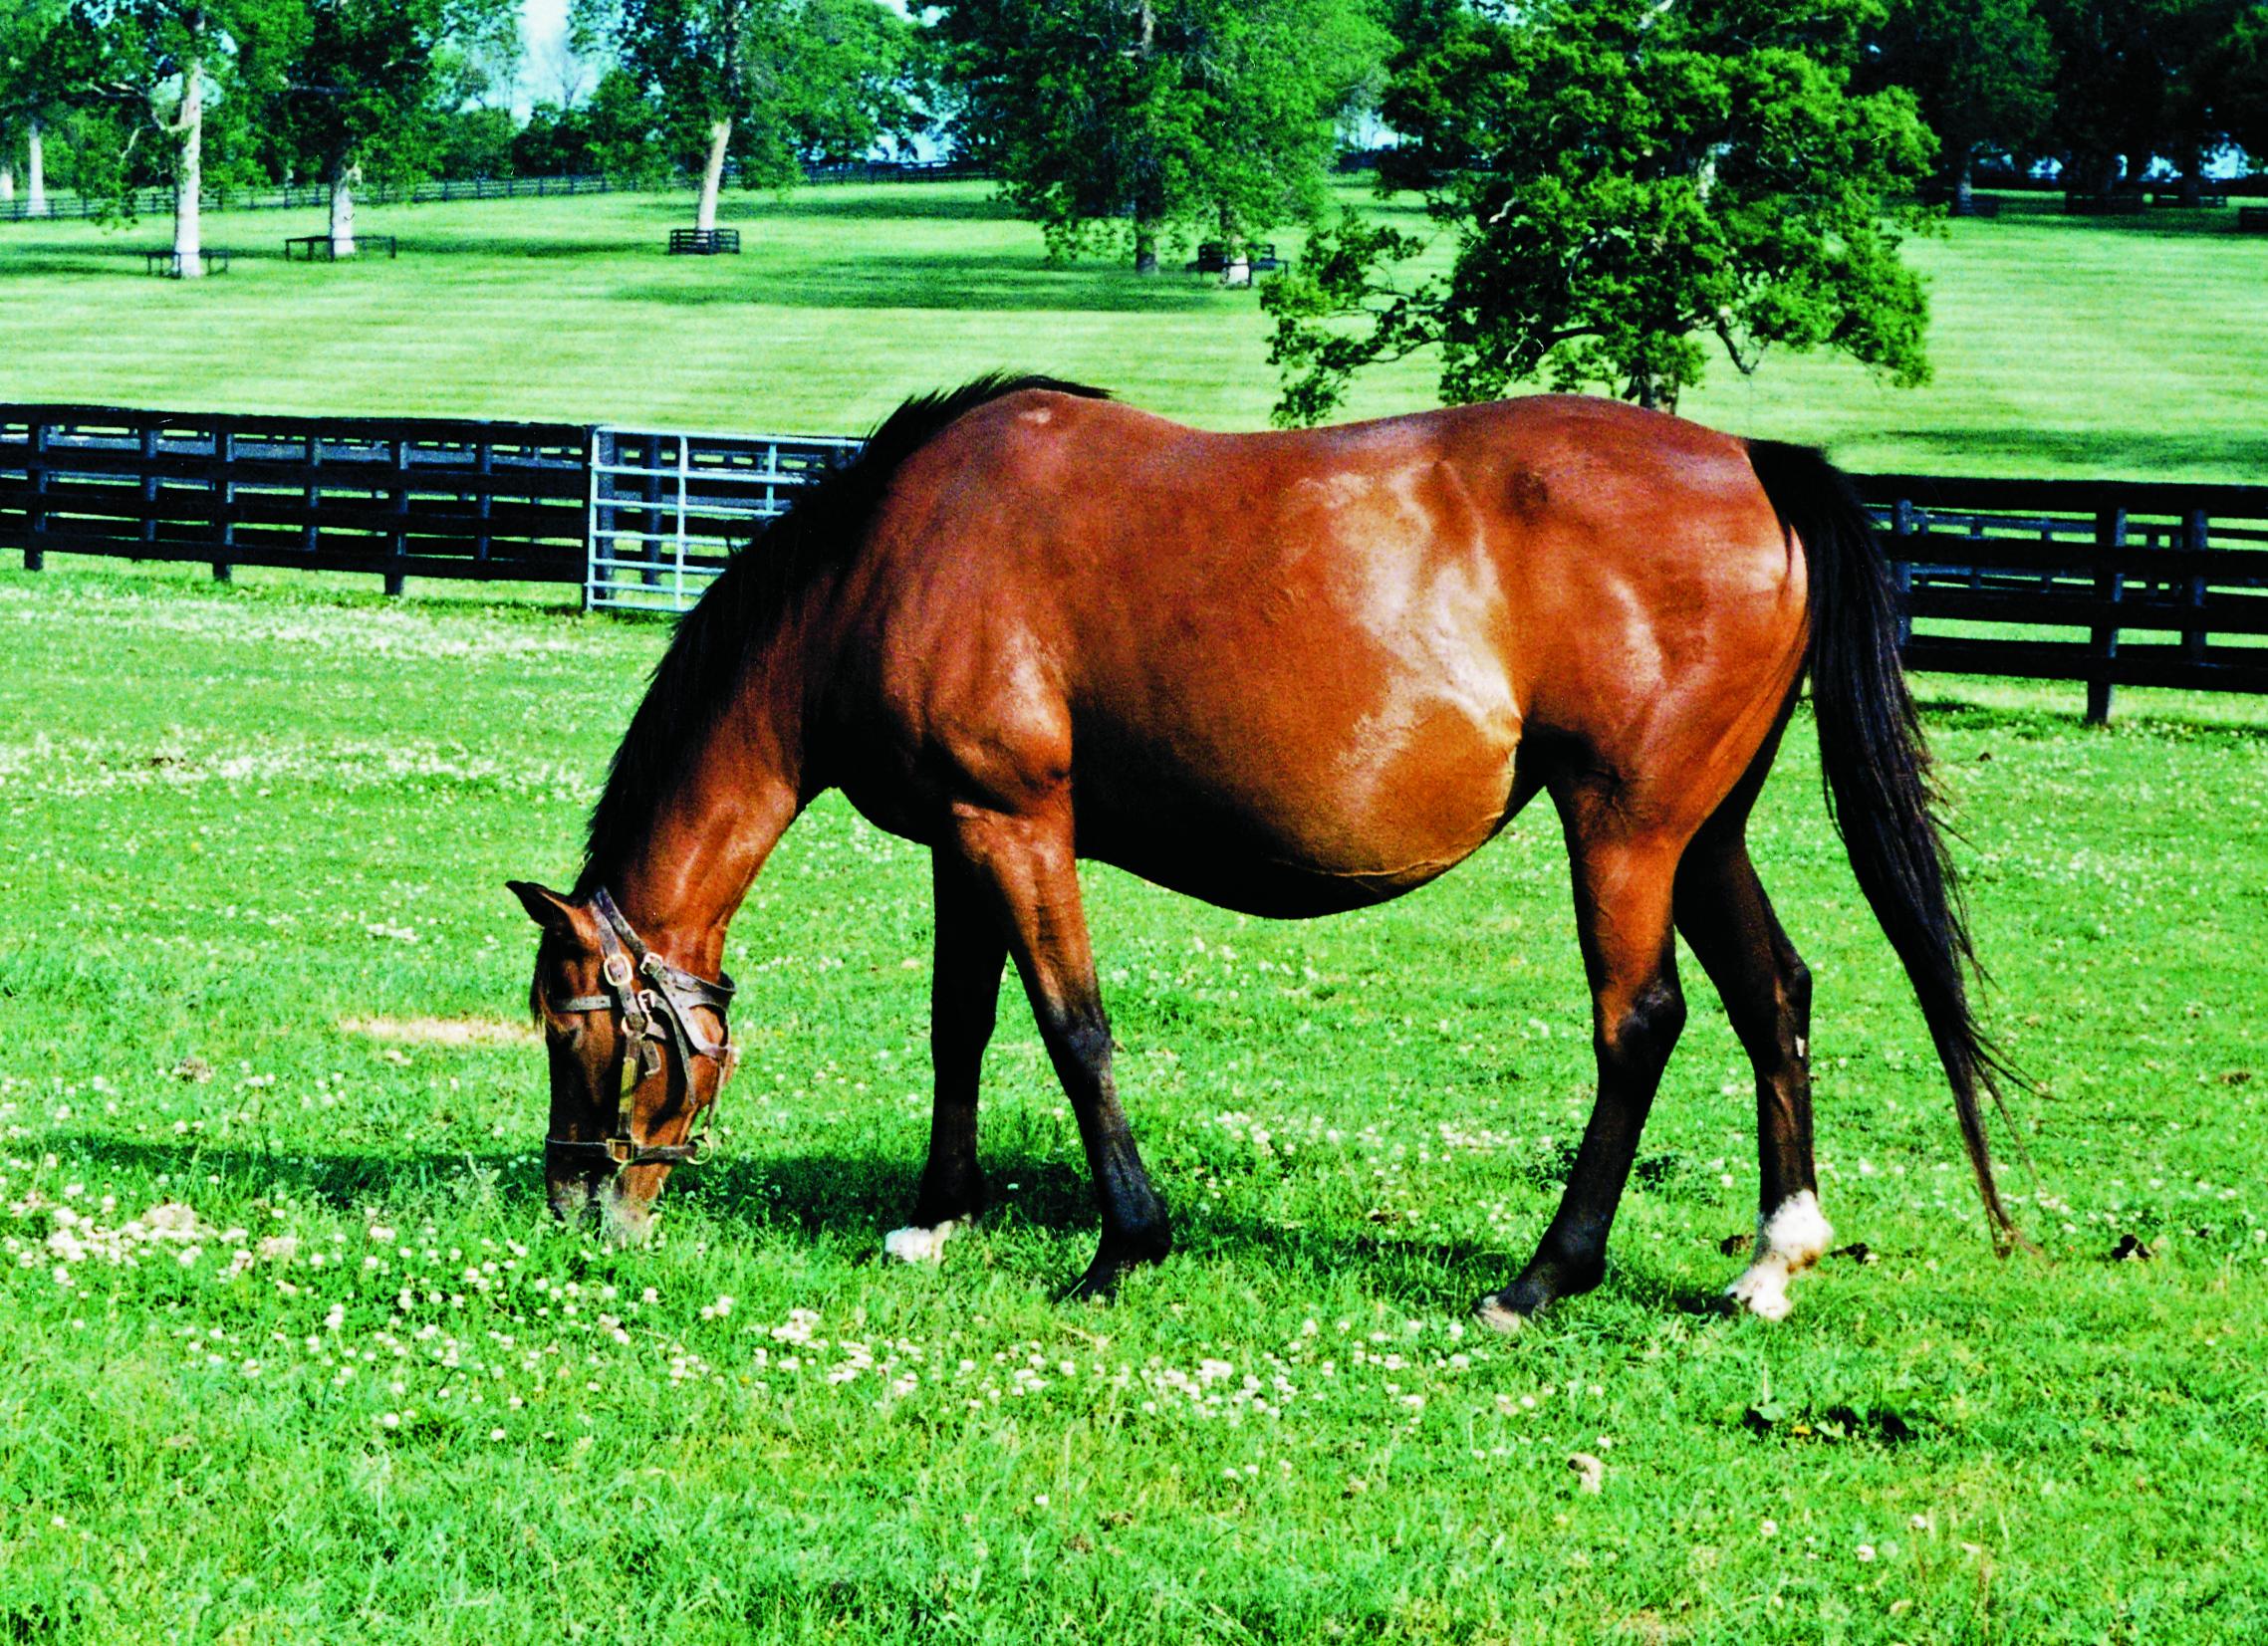 Pregnant horse photo